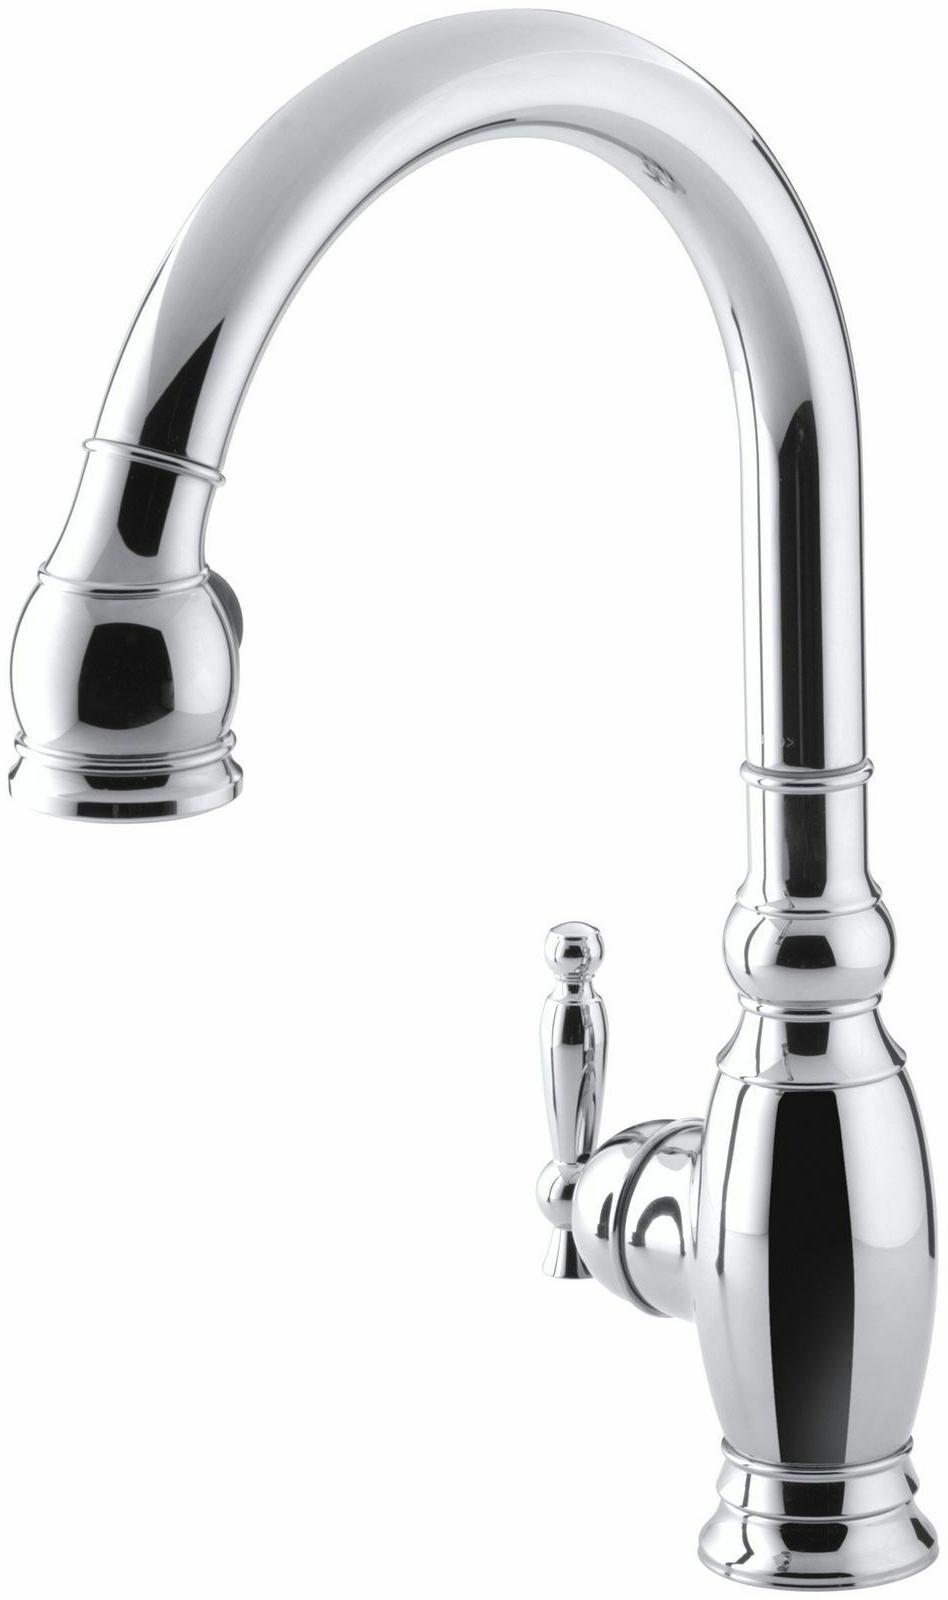 KH K-690-CP Vinnata Single-Hole or Three-Hole Kitchen Sink F